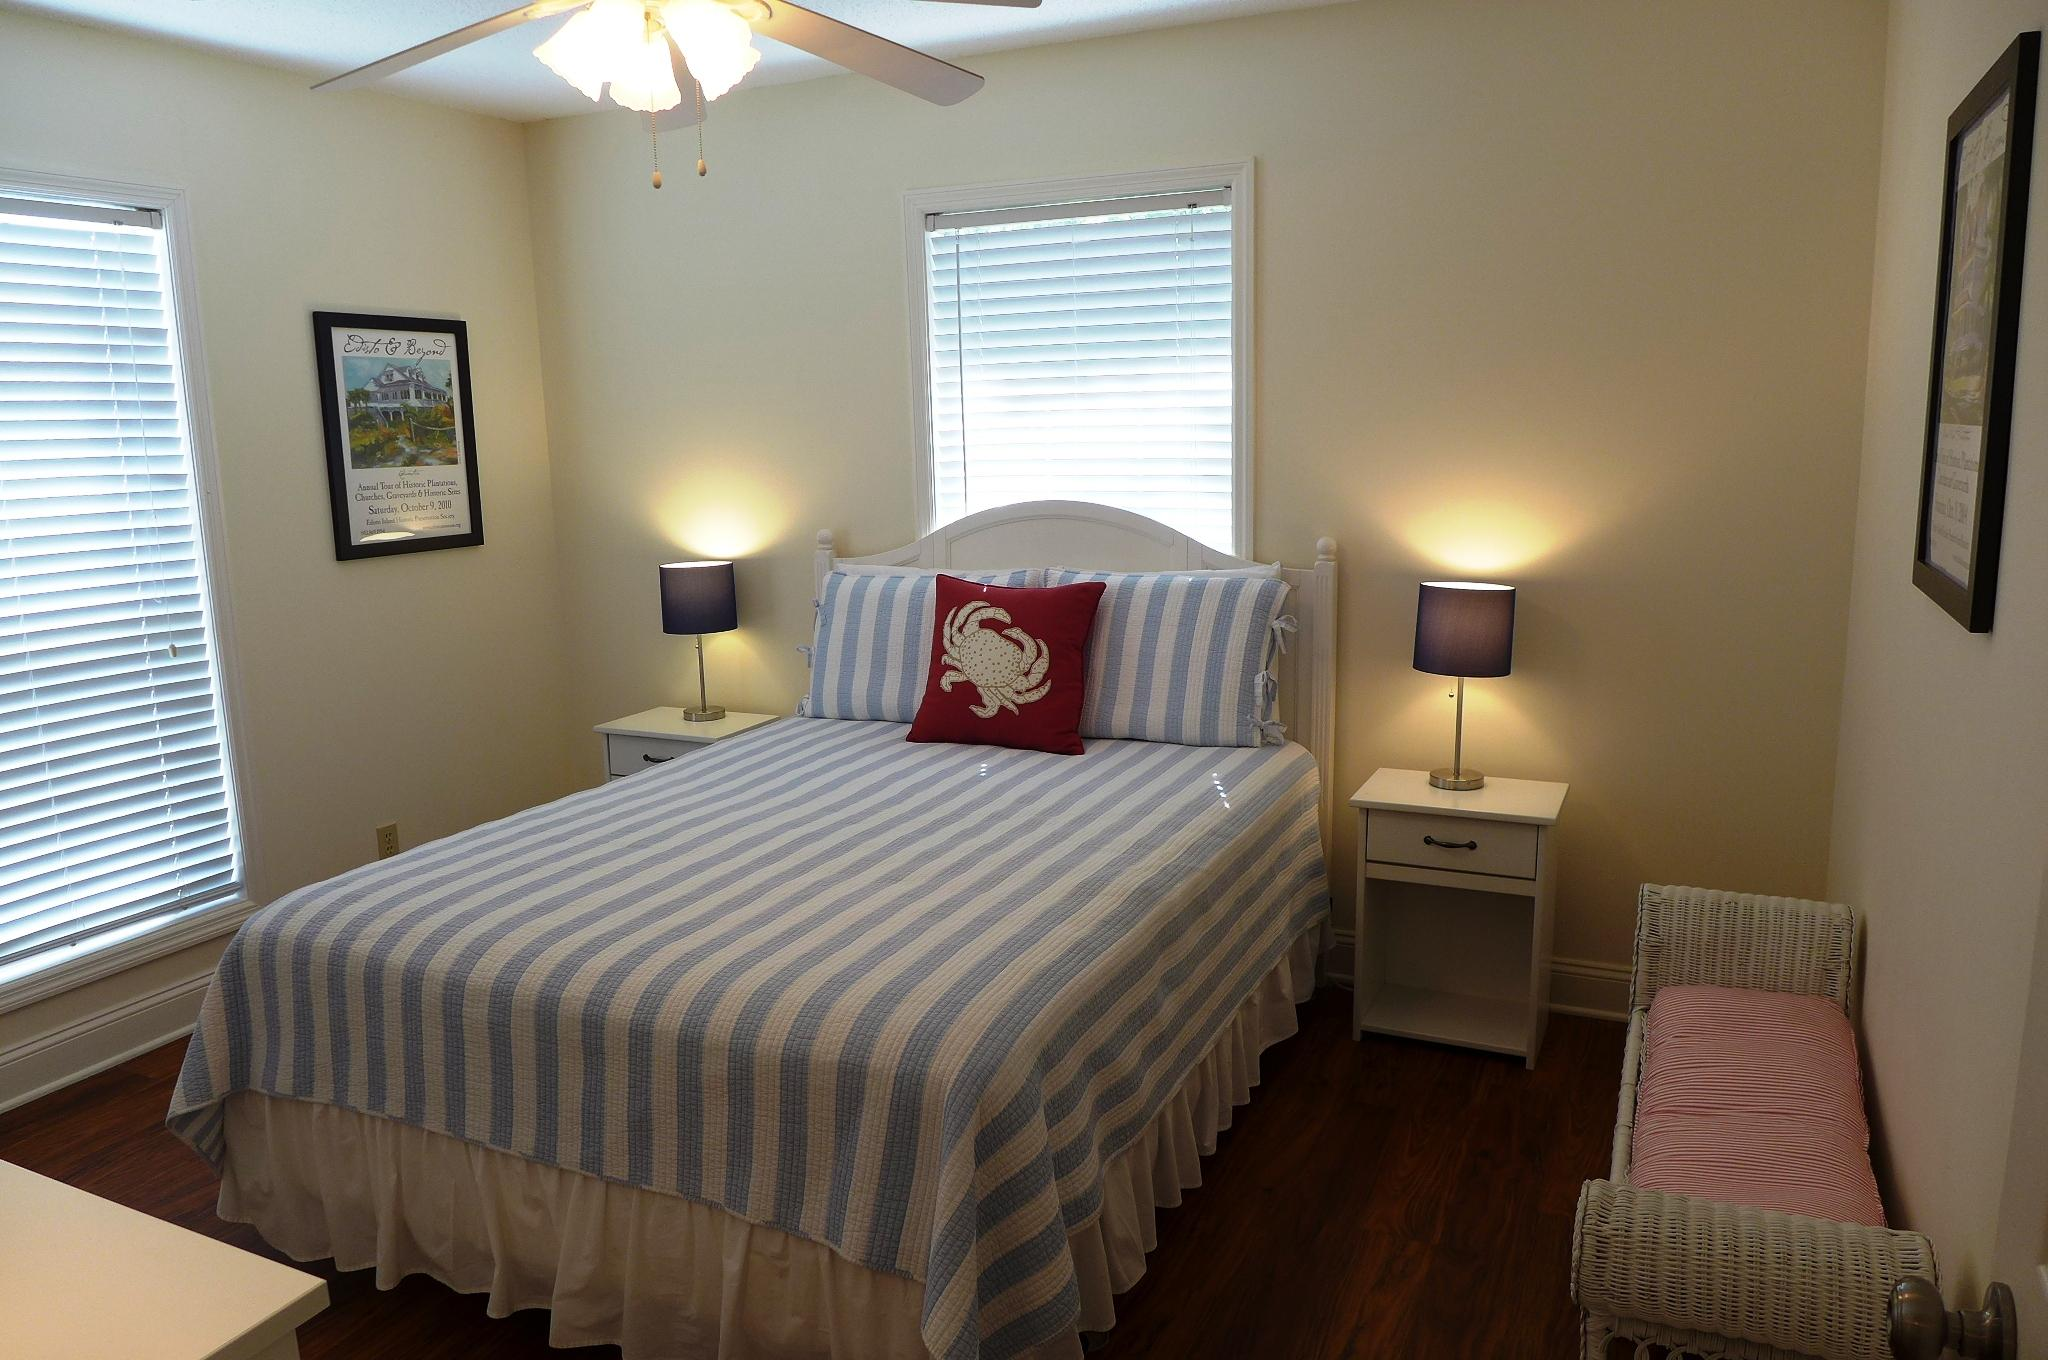 Edisto Beach Homes For Sale - 2202 Myrtle, Edisto Beach, SC - 15